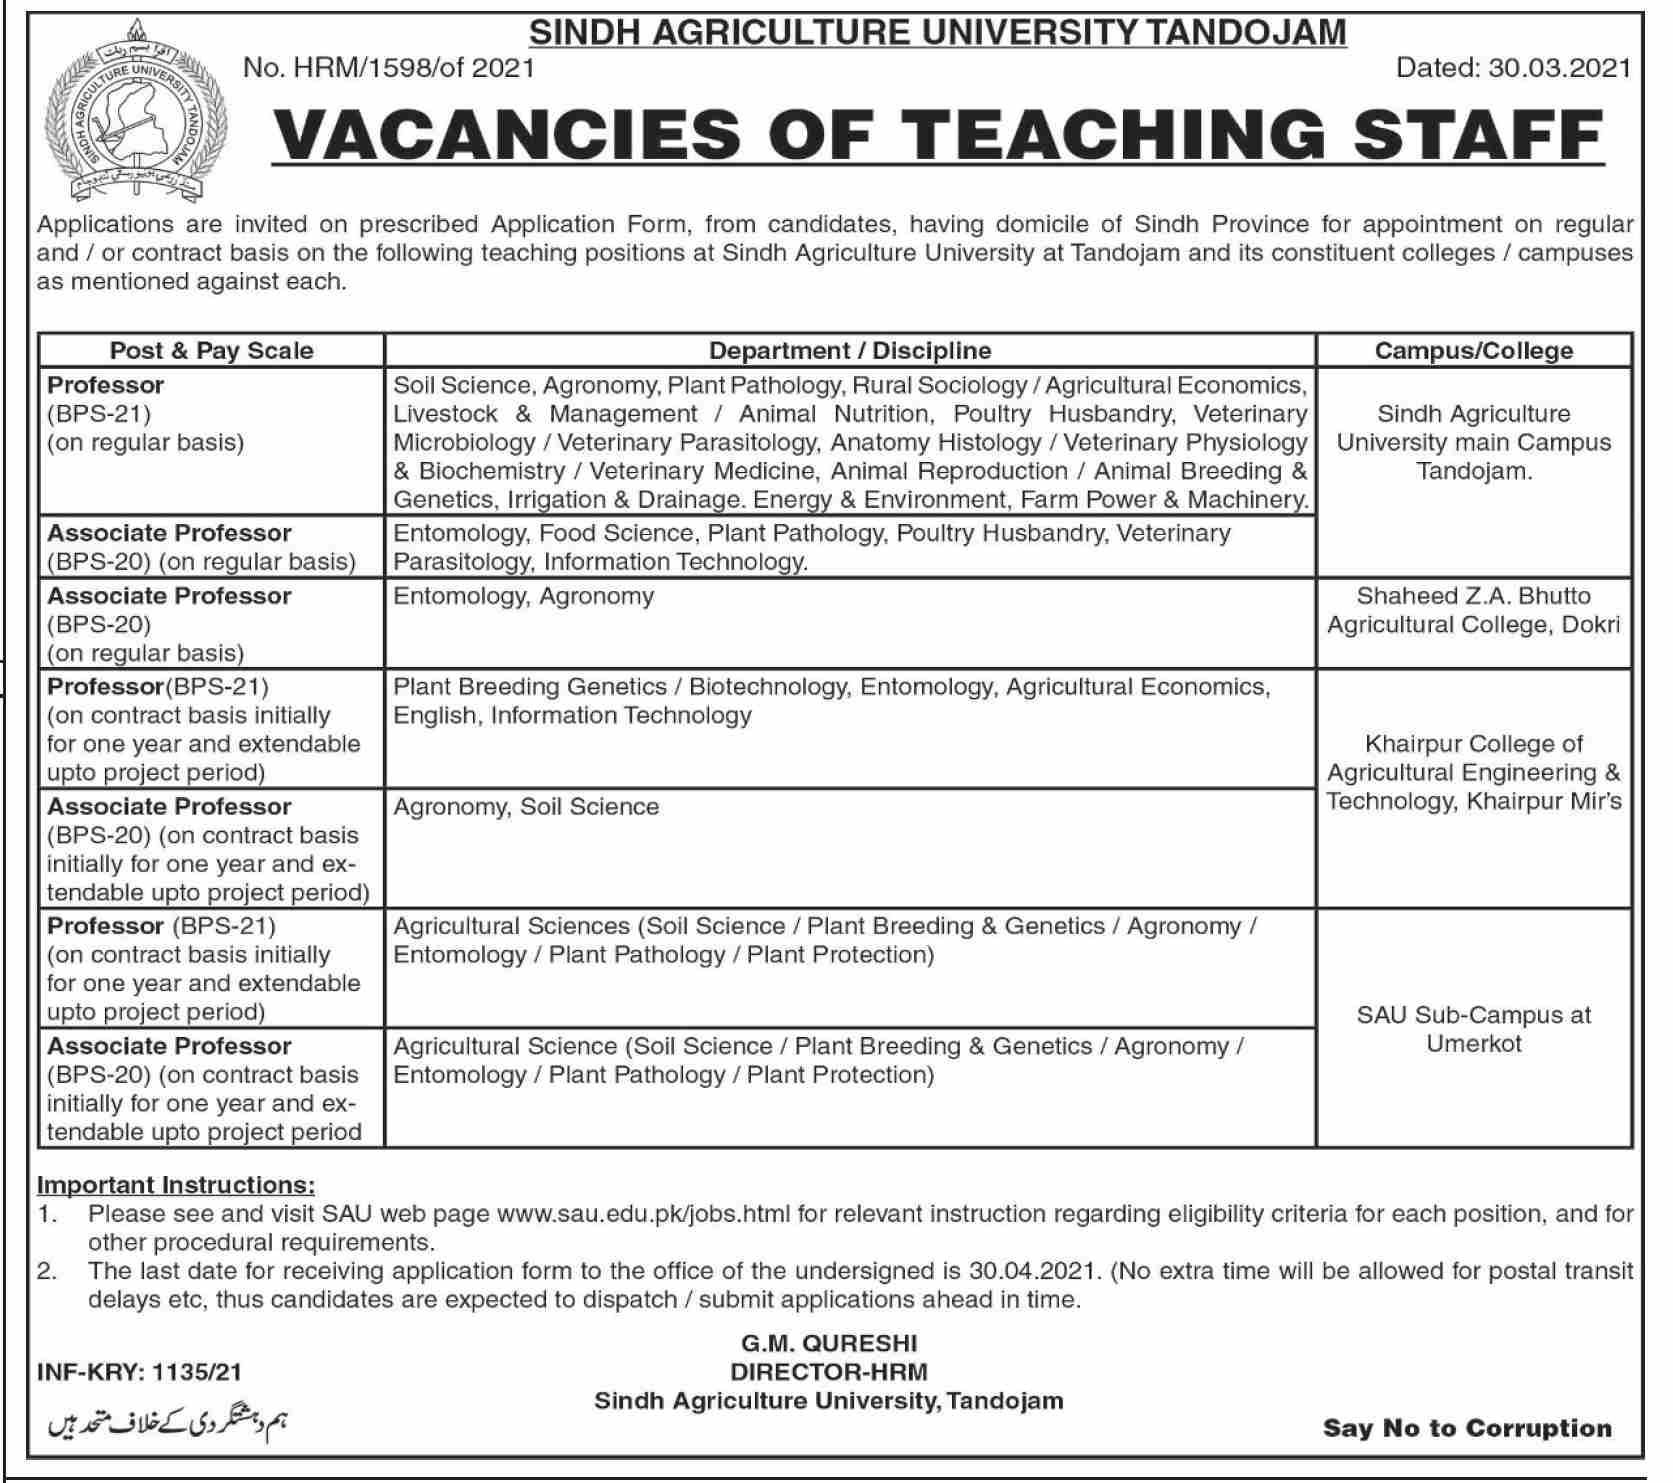 Sindh Agriculture University Tnadojam Jobs 2021 Latest Advertisement - Vacancies of Teaching Staff - Jobs in Sindh Agriculture University 2021